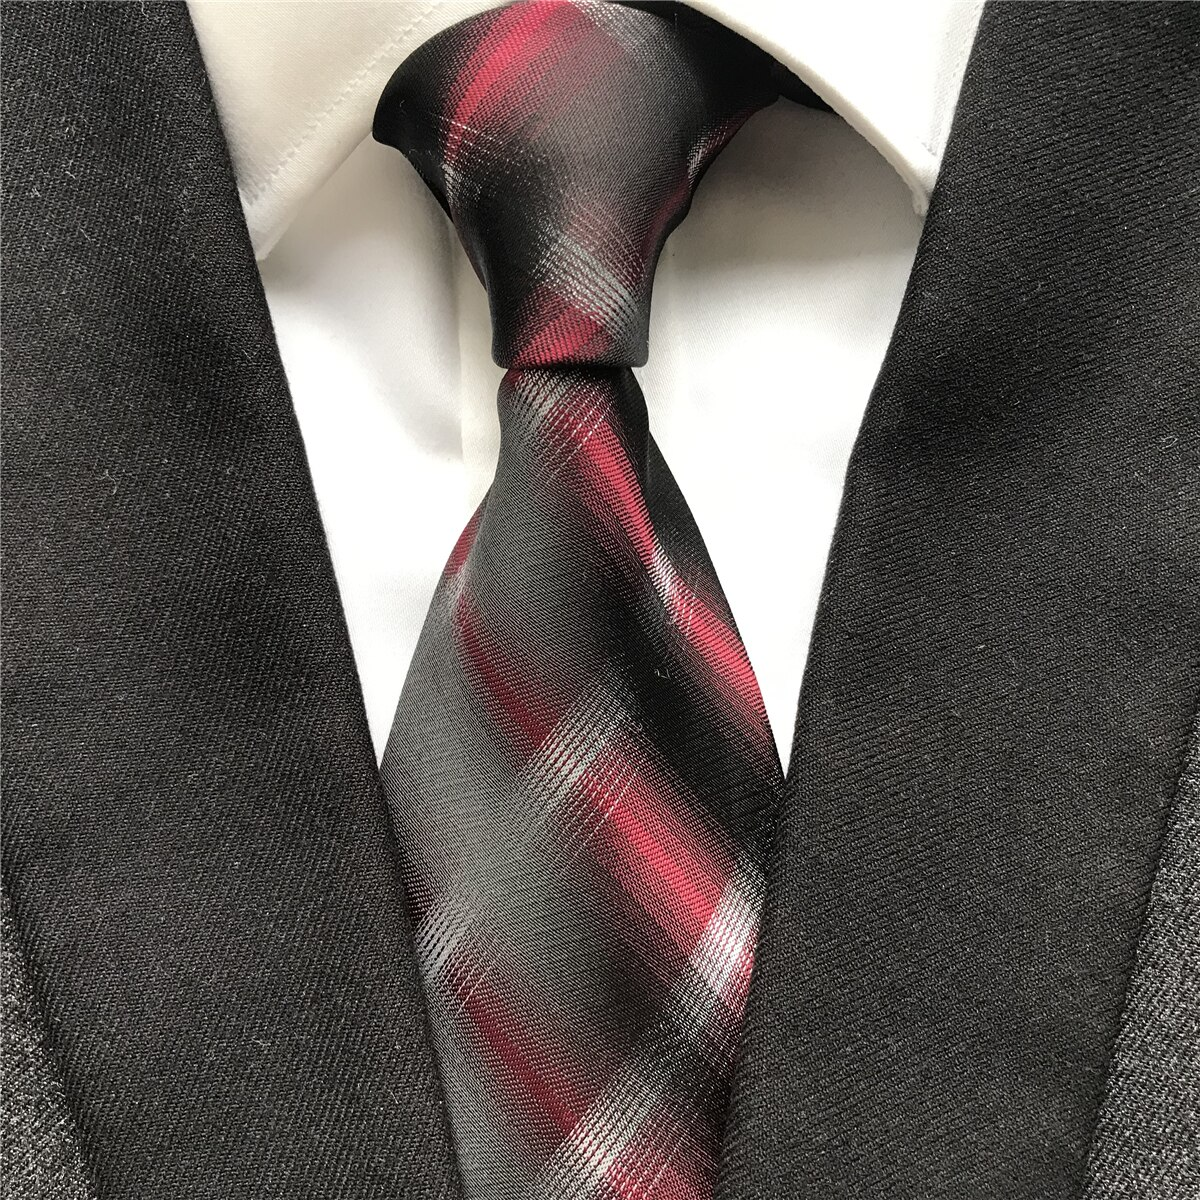 10 cm Width New Design Mens Ties Jacquard Woven Neck Tie Fashion Red Plaids Corbatas Neckties for Wedding Meeting